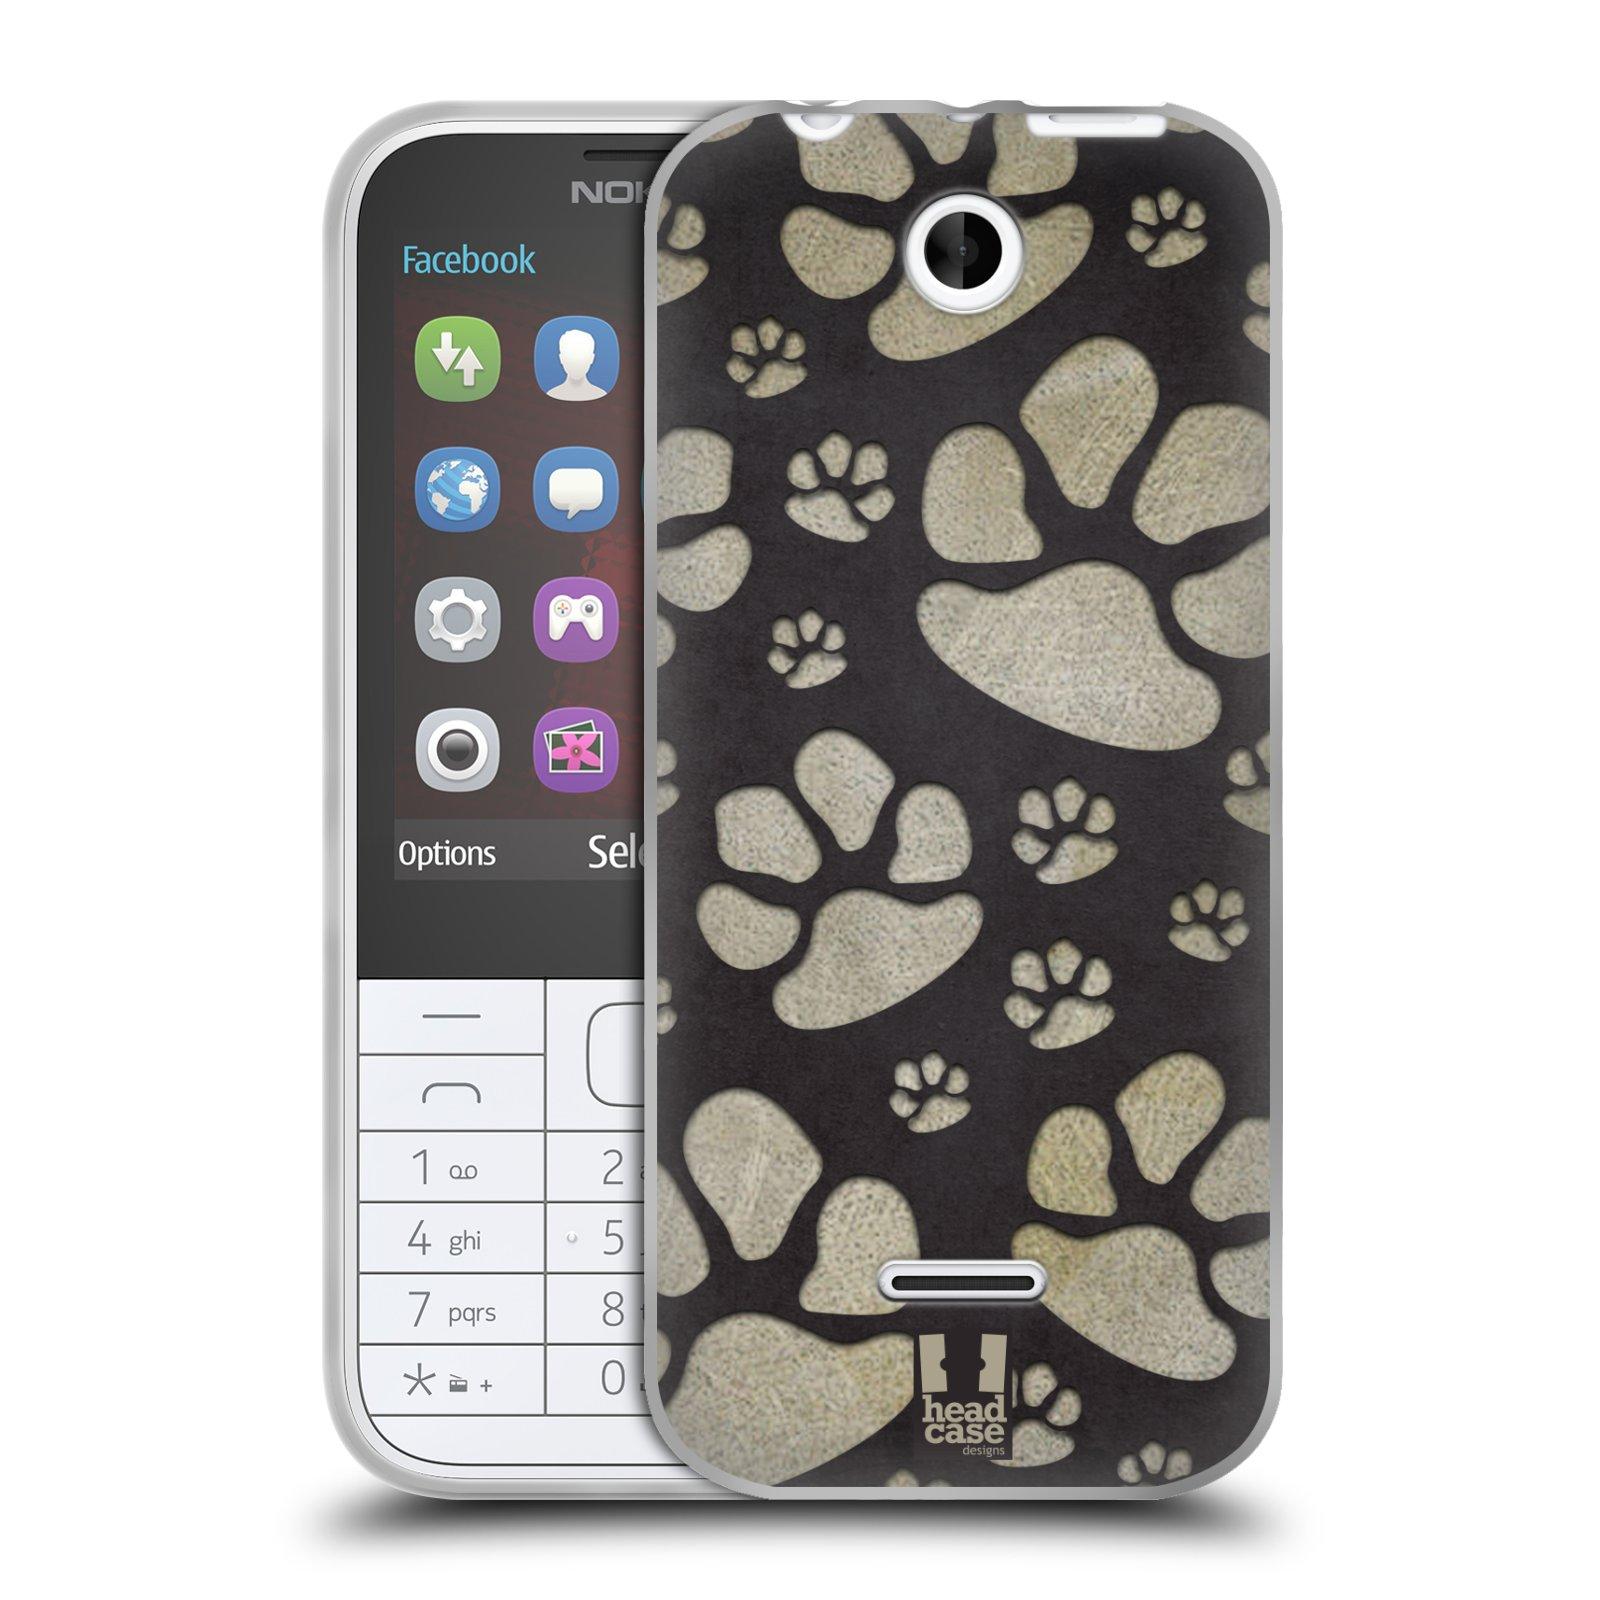 Silikonové pouzdro na mobil Nokia 225 HEAD CASE TLAPKY ŠEDÉ (Silikonový kryt či obal na mobilní telefon Nokia 225)